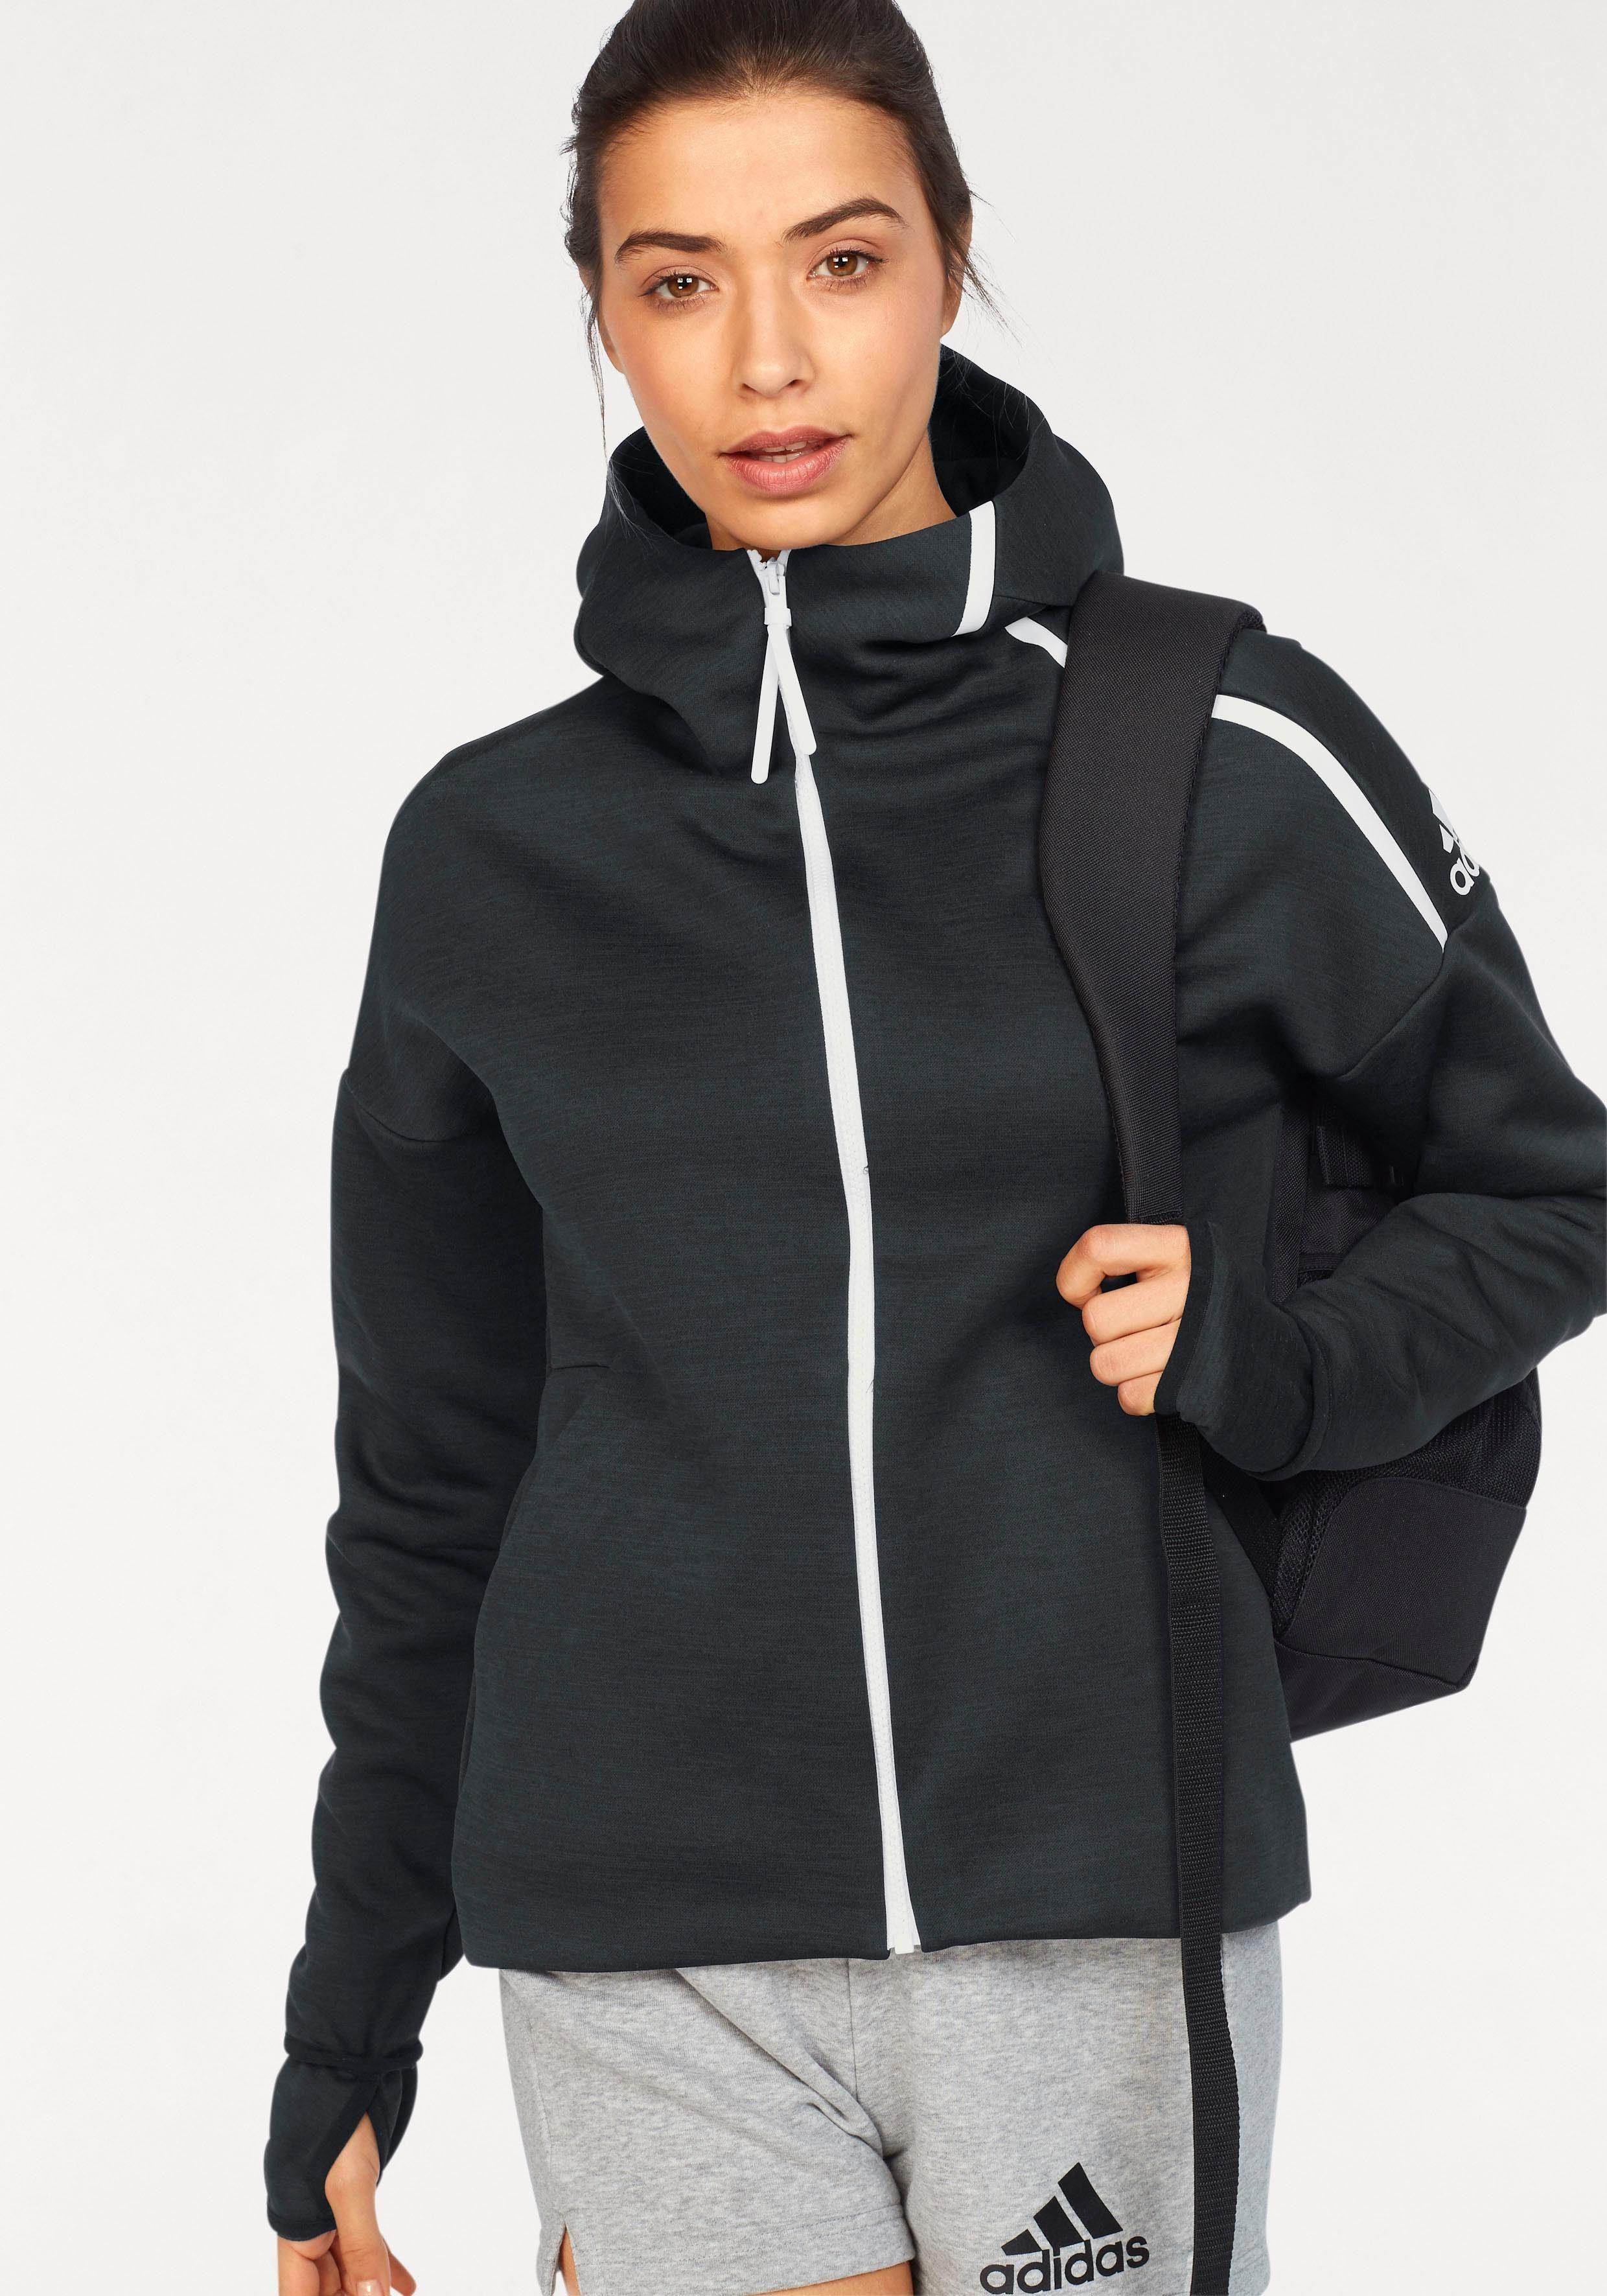 adidas Performance Trainingsjacke »WOMEN Z.N.E. FAST RELEASE HOODIE« auch in großen Größen online kaufen   OTTO